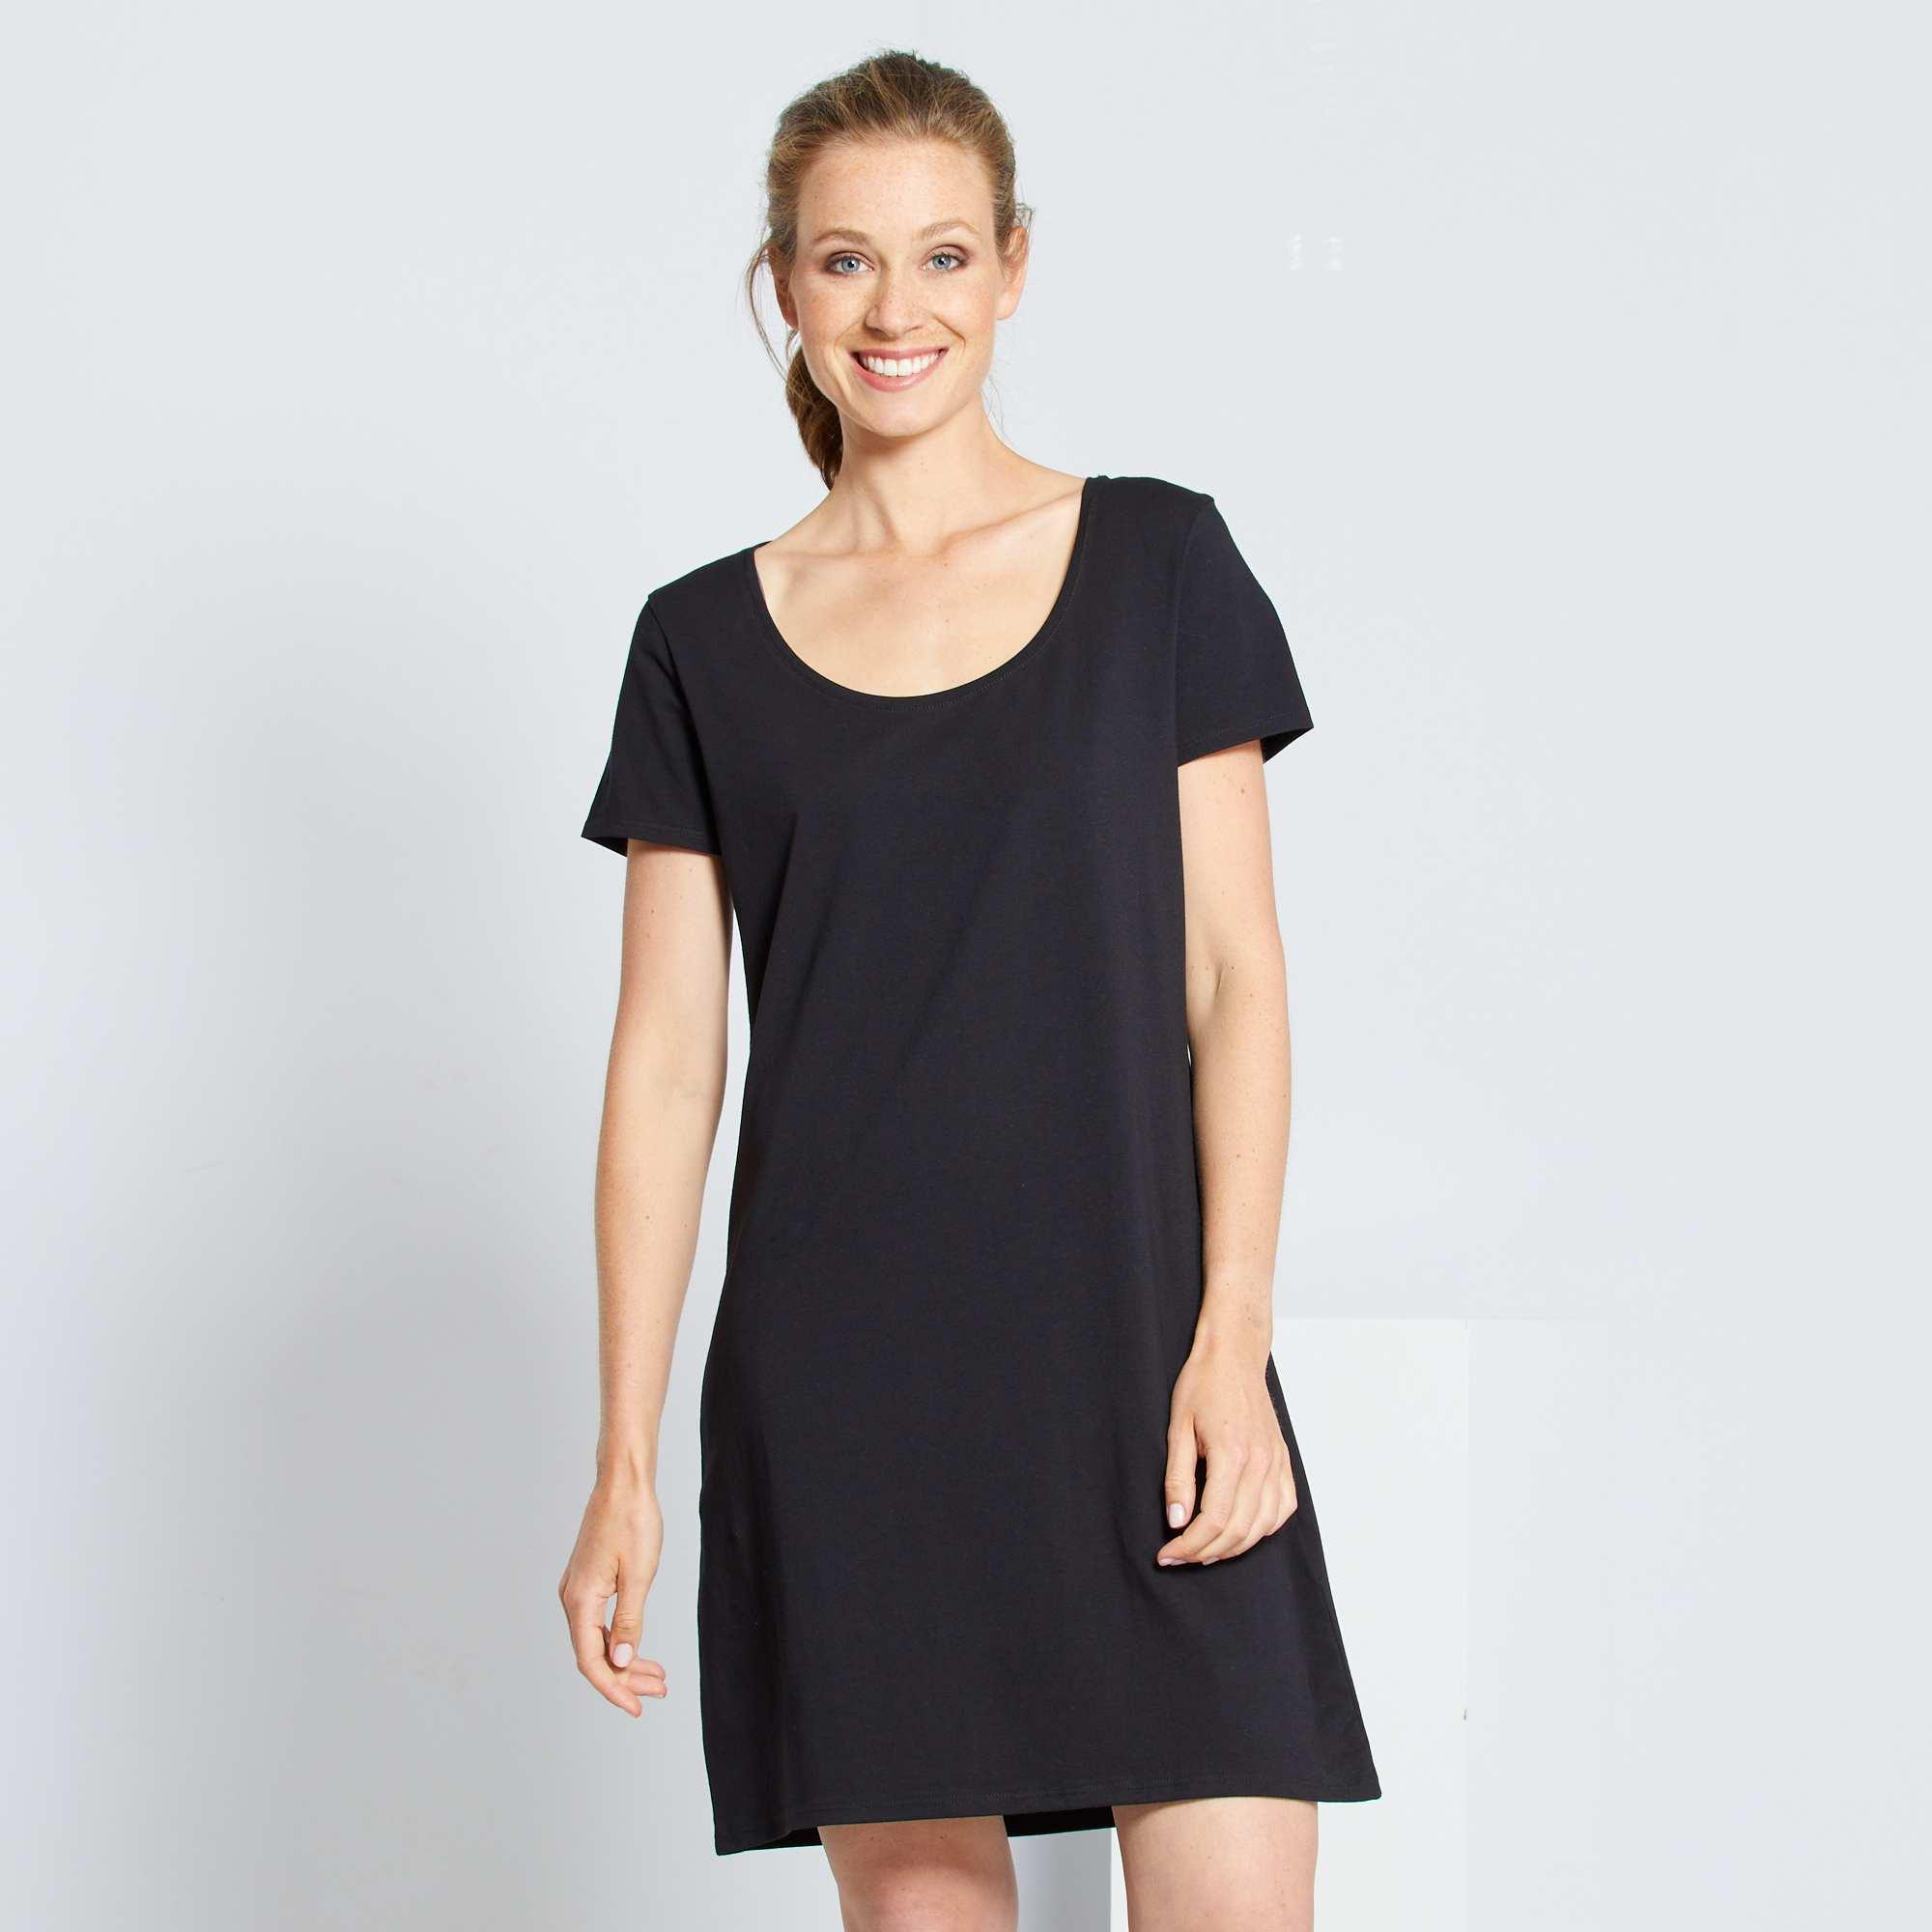 Vestido tipo camiseta Mujer - negro - Kiabi - 8,00€